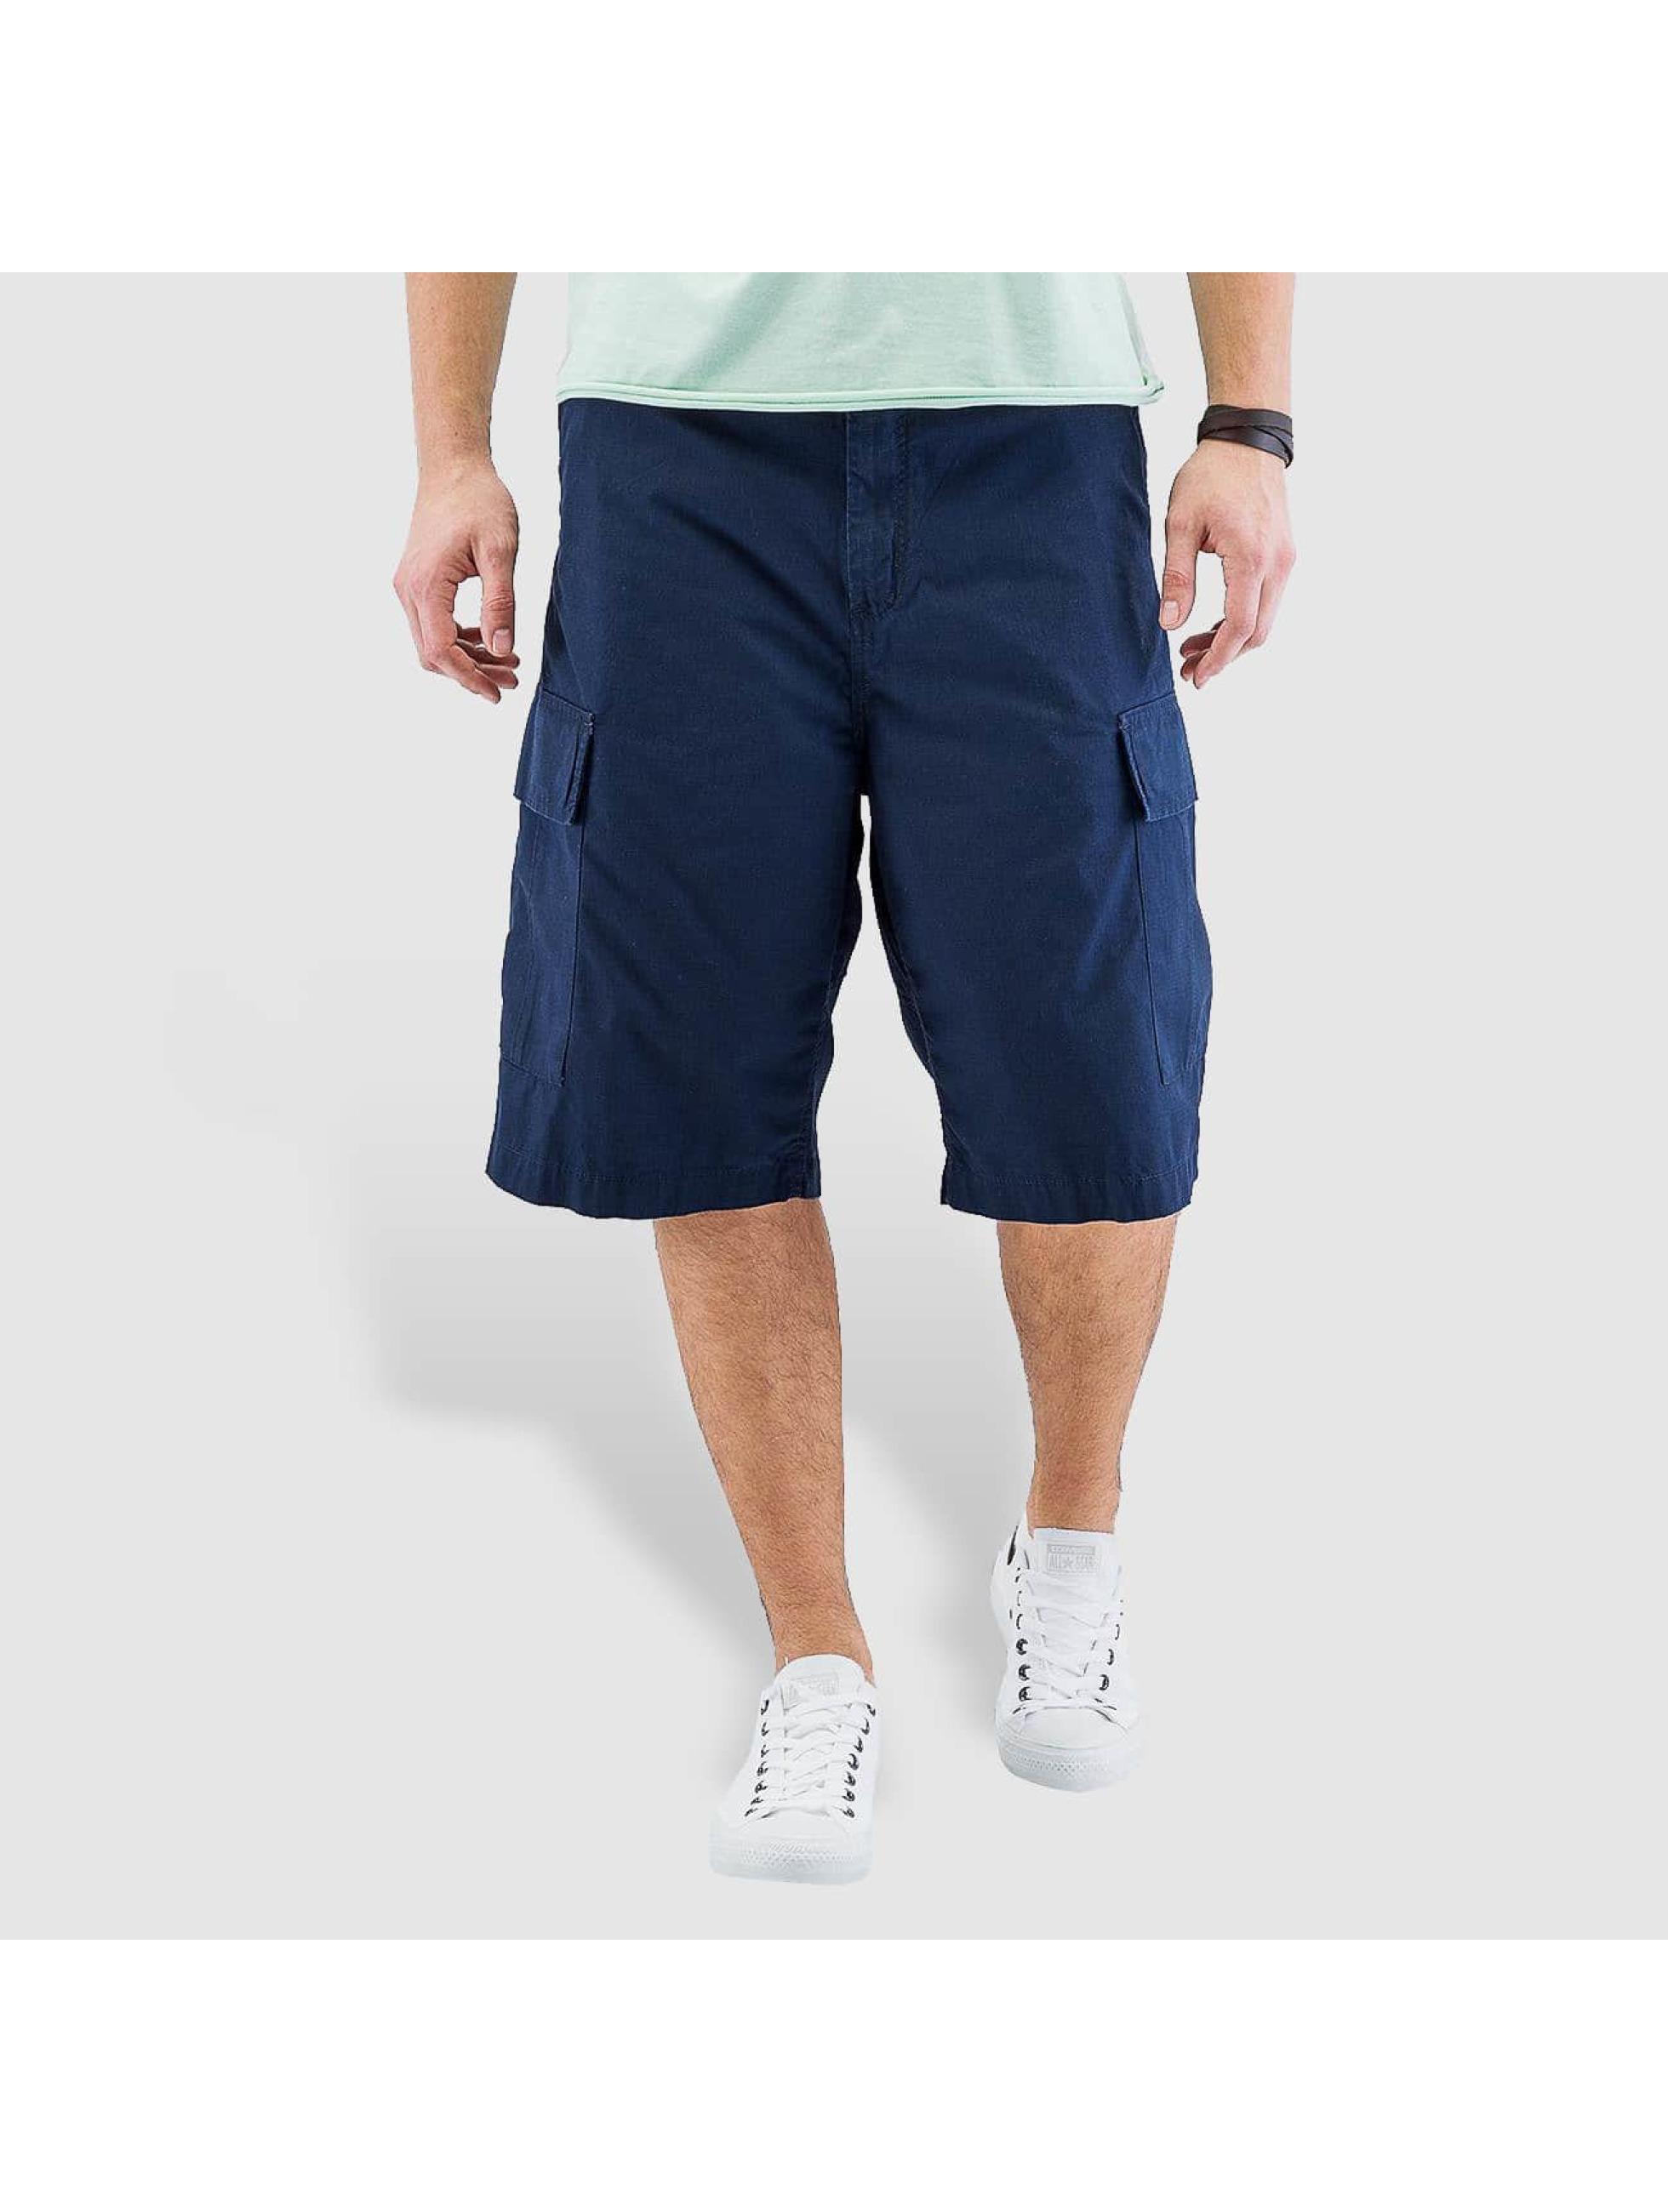 Carhartt WIP Shorts Columbia Ripstop blau